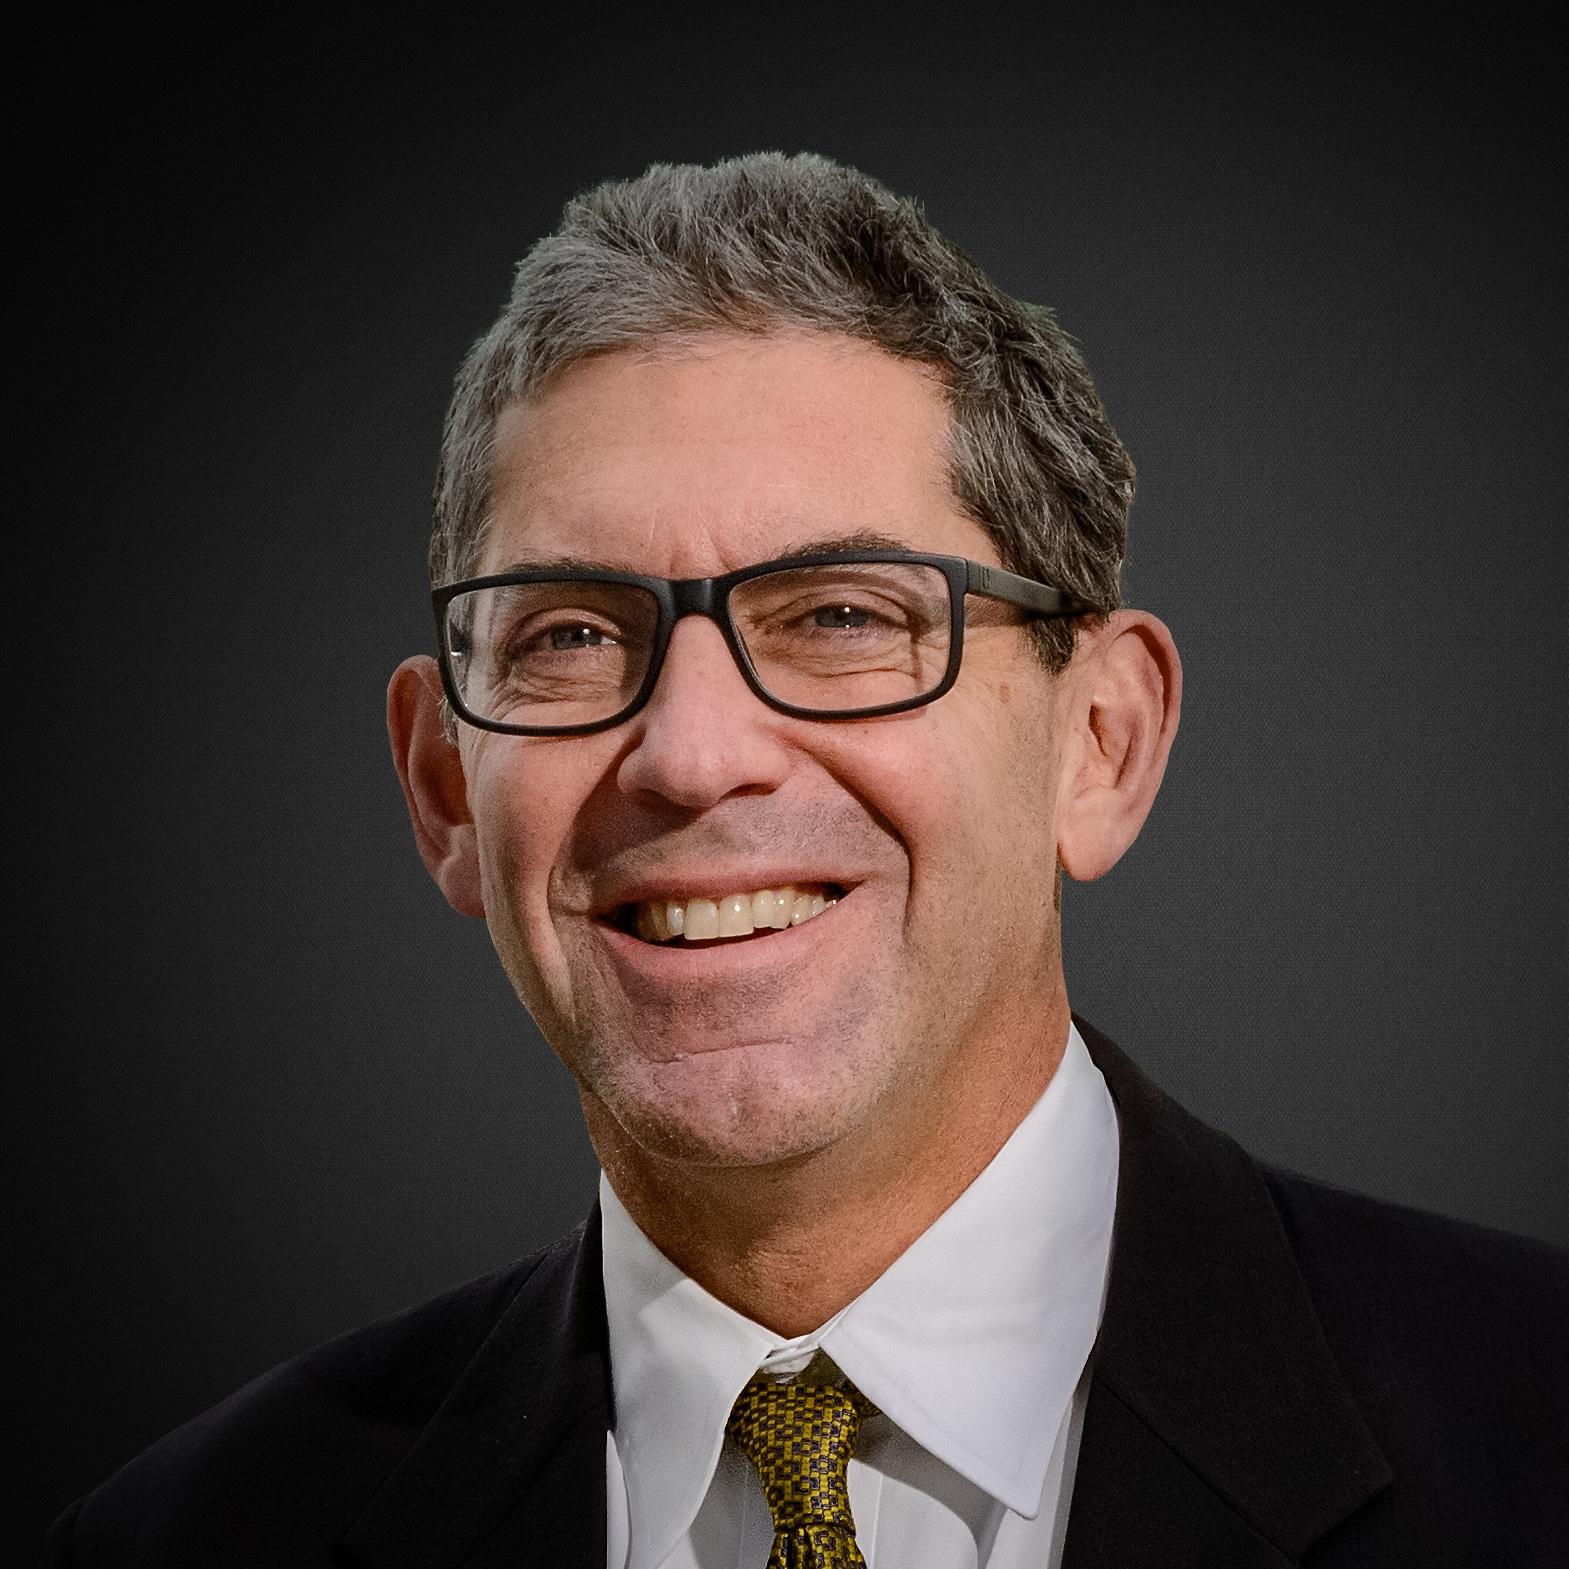 Steven Guttentag Venture Partner, Education